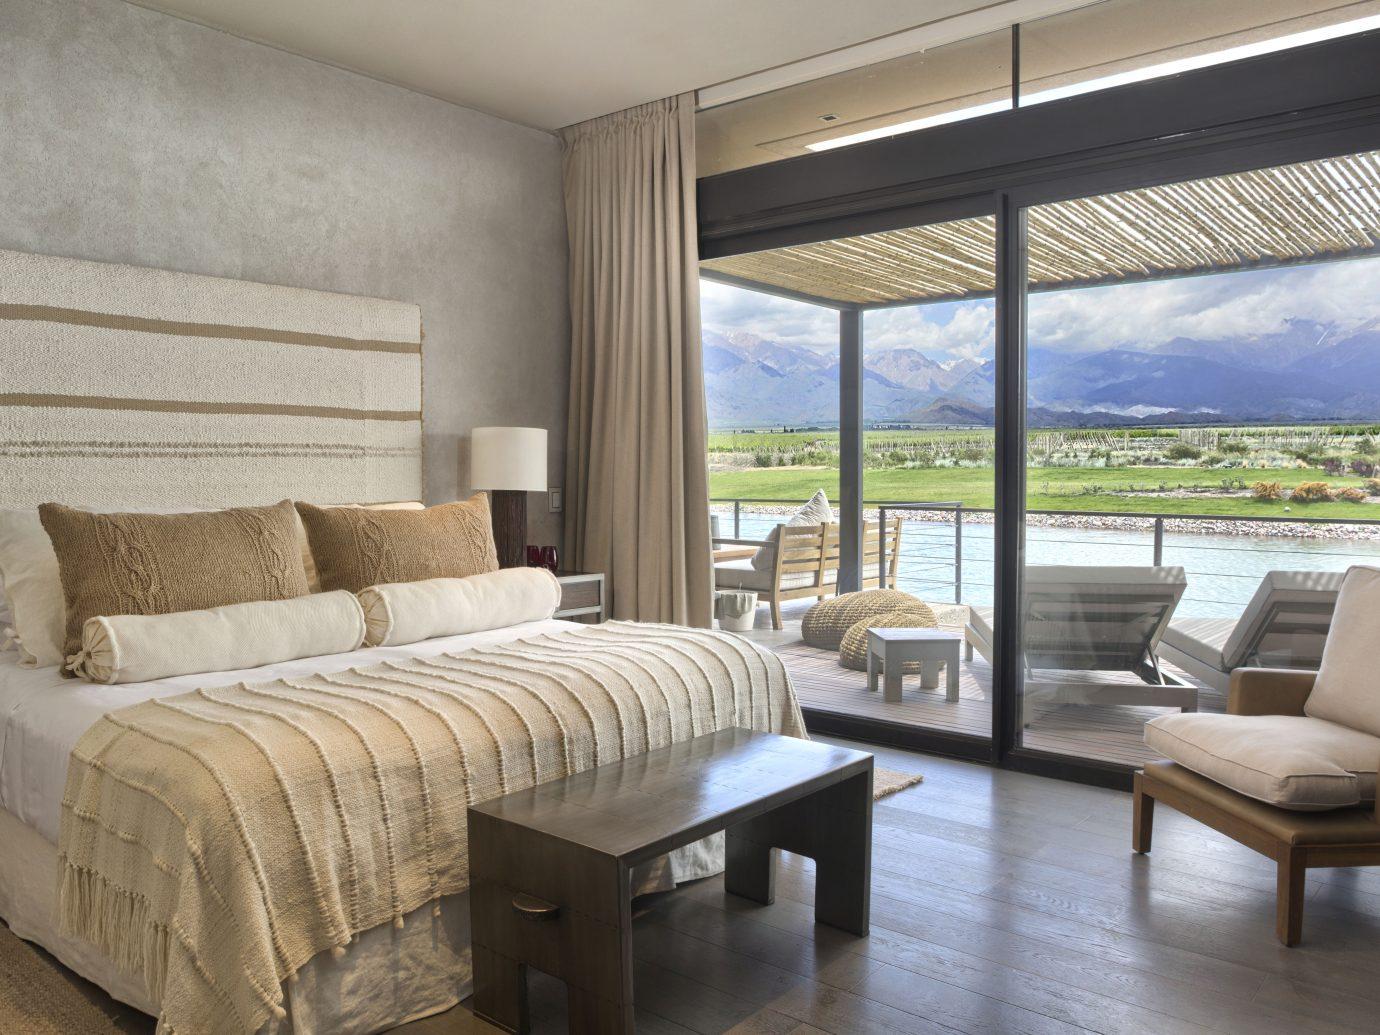 Bedroom at The Vines Resort & Spa